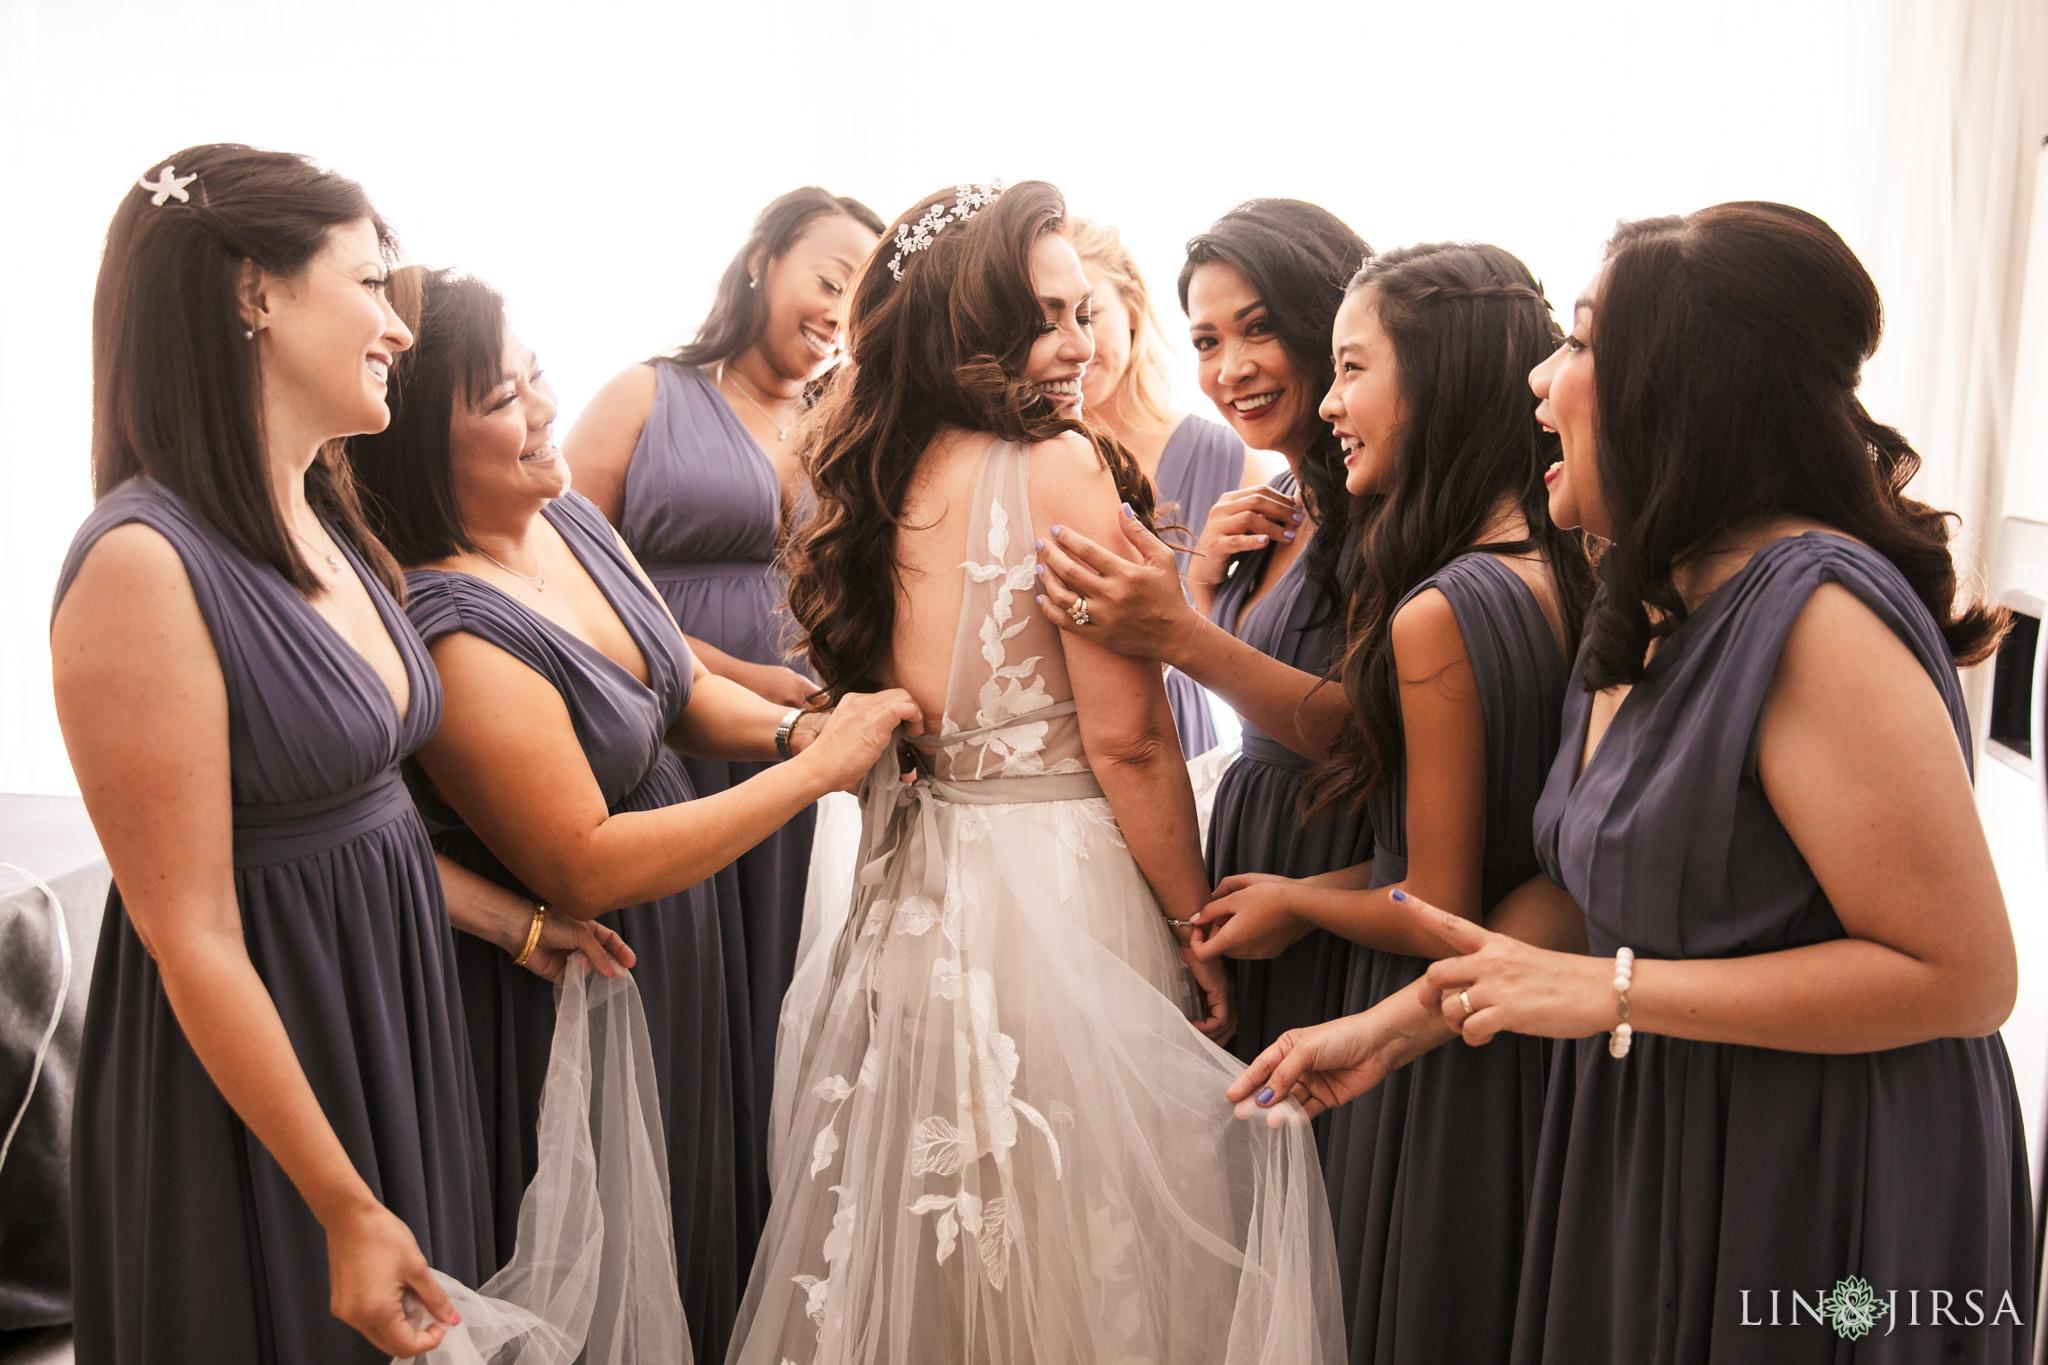 002 orange county bride wedding photography